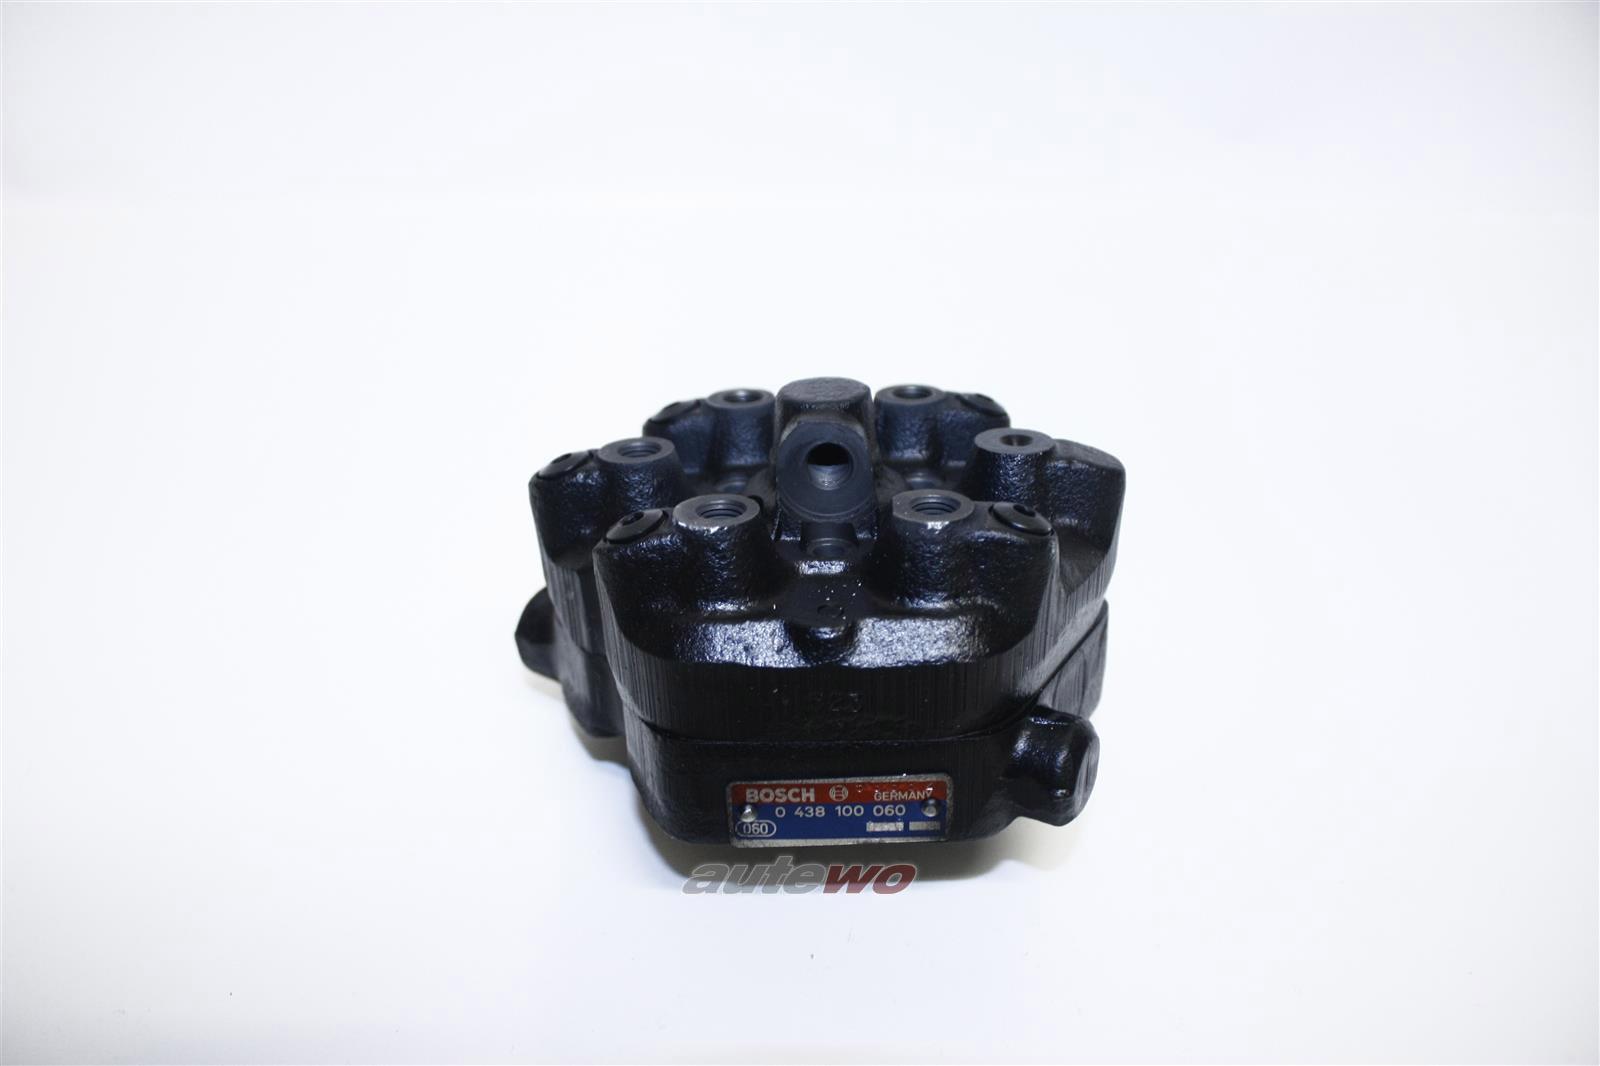 035133481B 0438100060 NEU Audi/VW 90/Coupe Typ 81/100 Typ 43 2.1l Mengenteiler